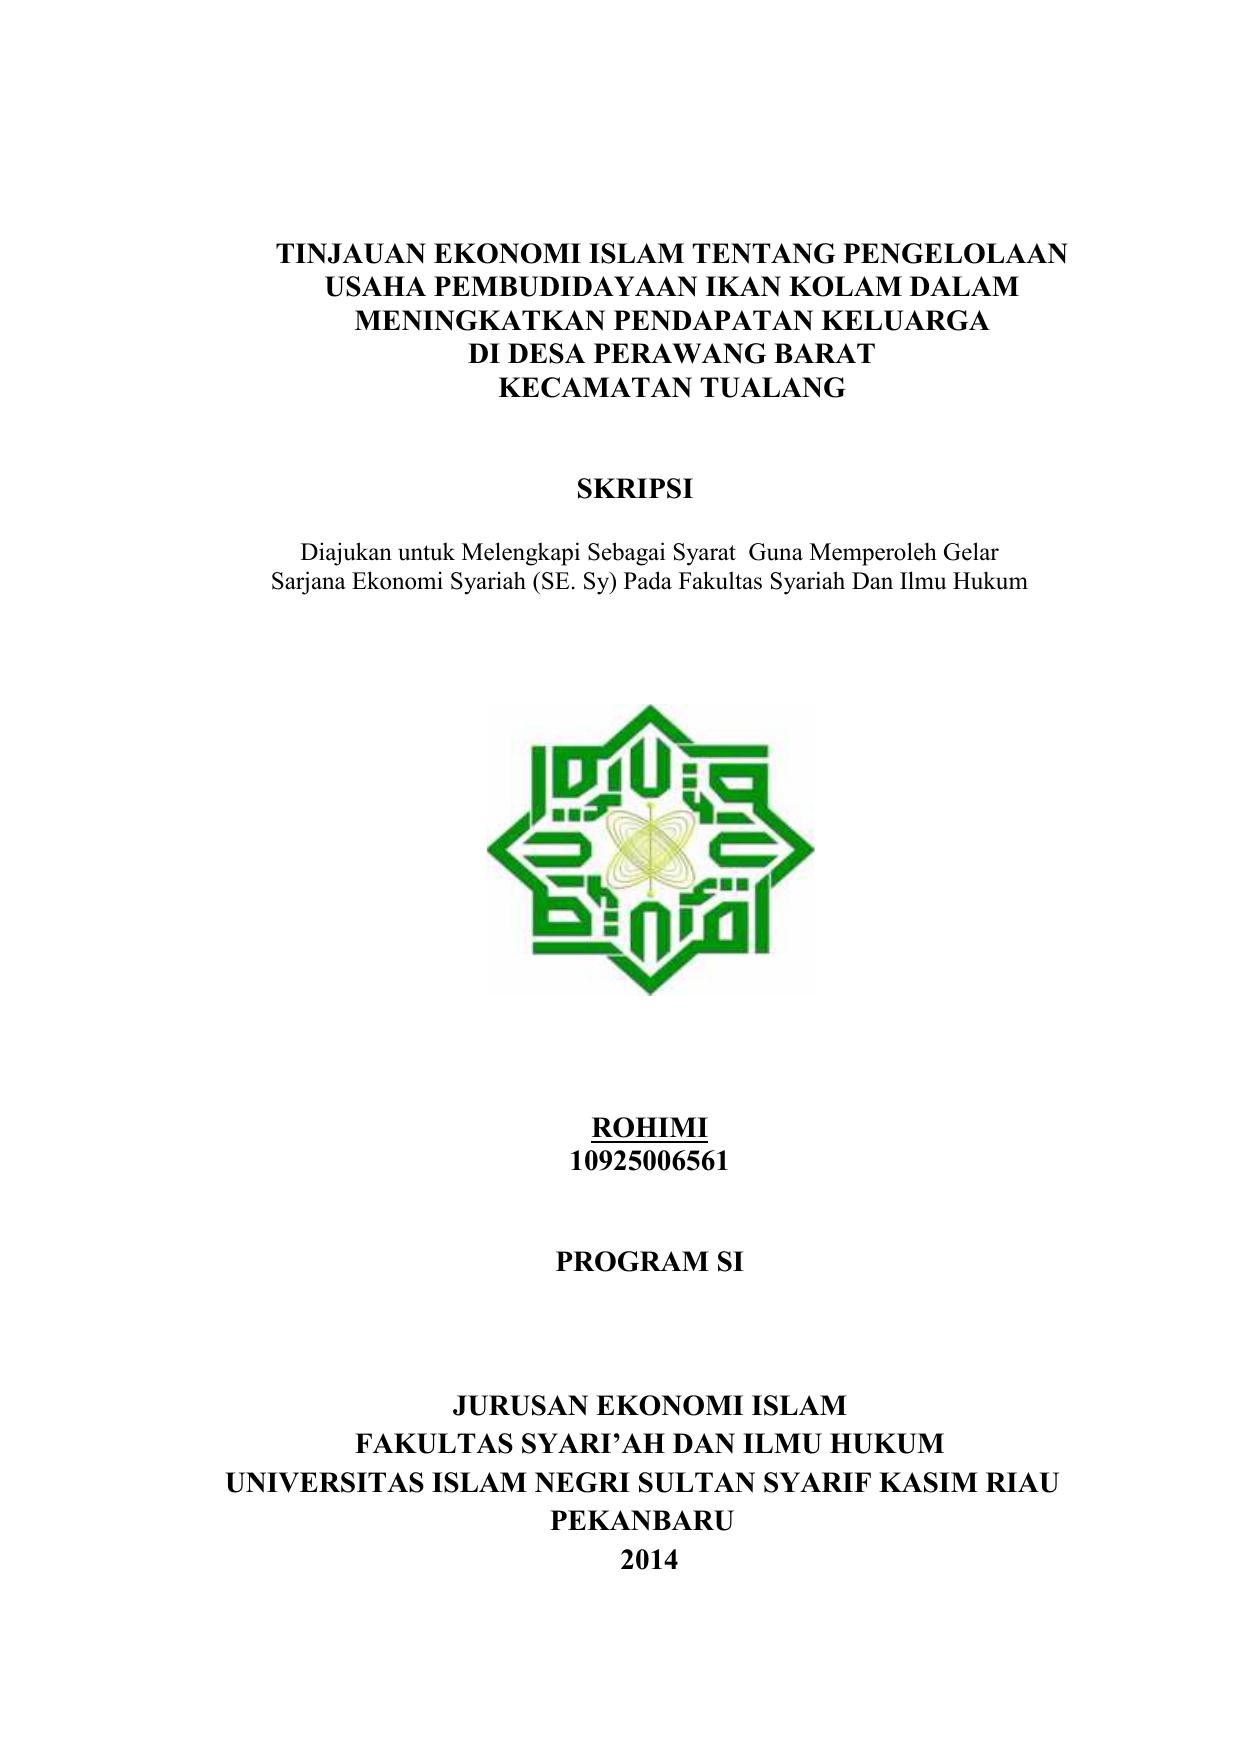 Tinjauan Ekonomi Islam Tentang Pengelolaan Usaha Pembudidayaan